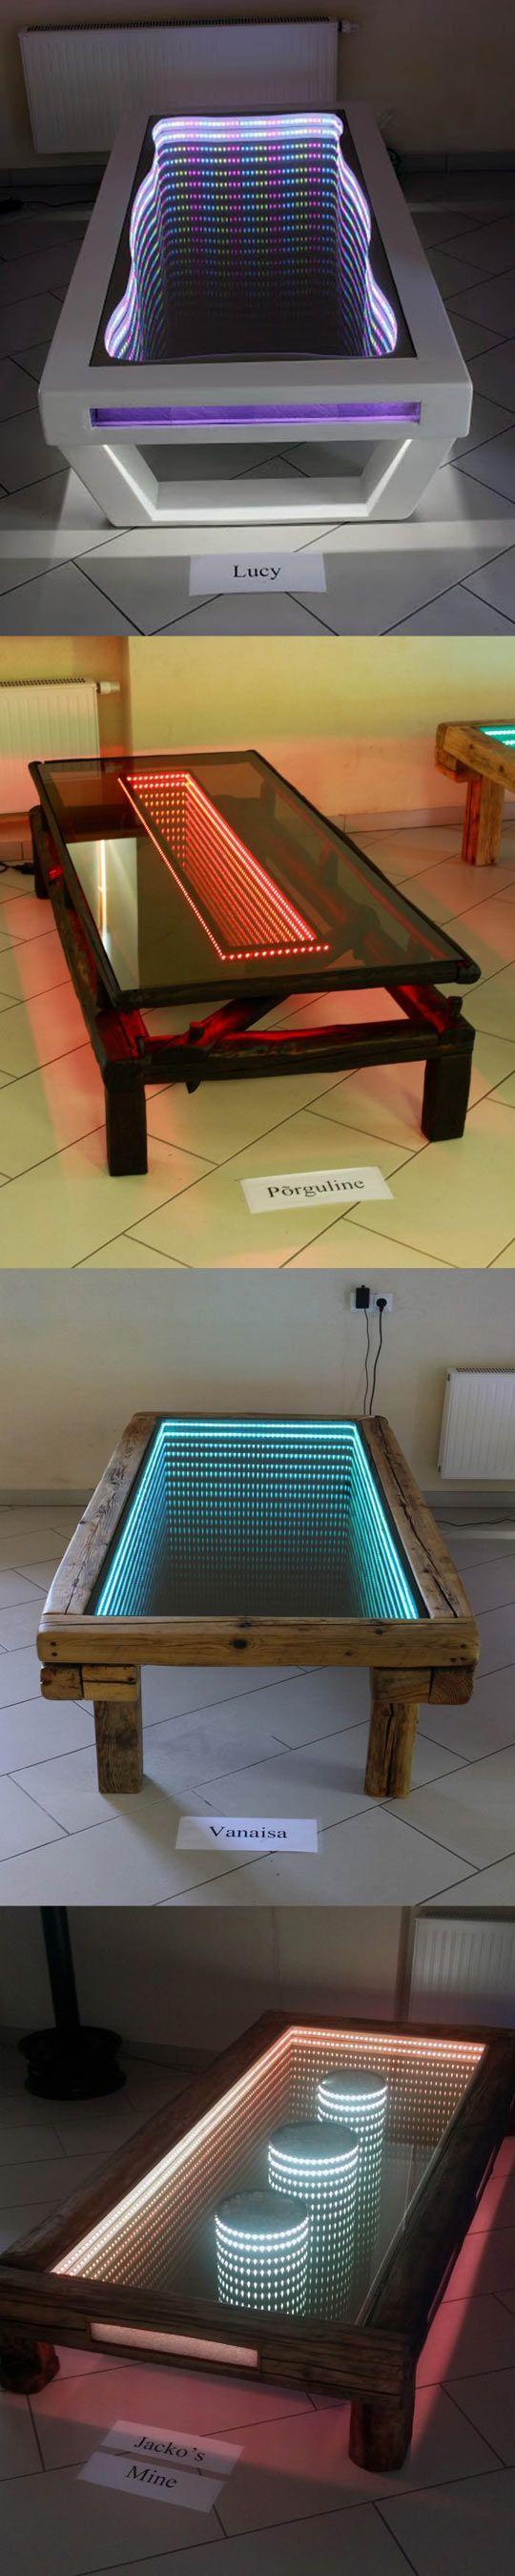 Handmade Infinity Tables #DIY inspiration